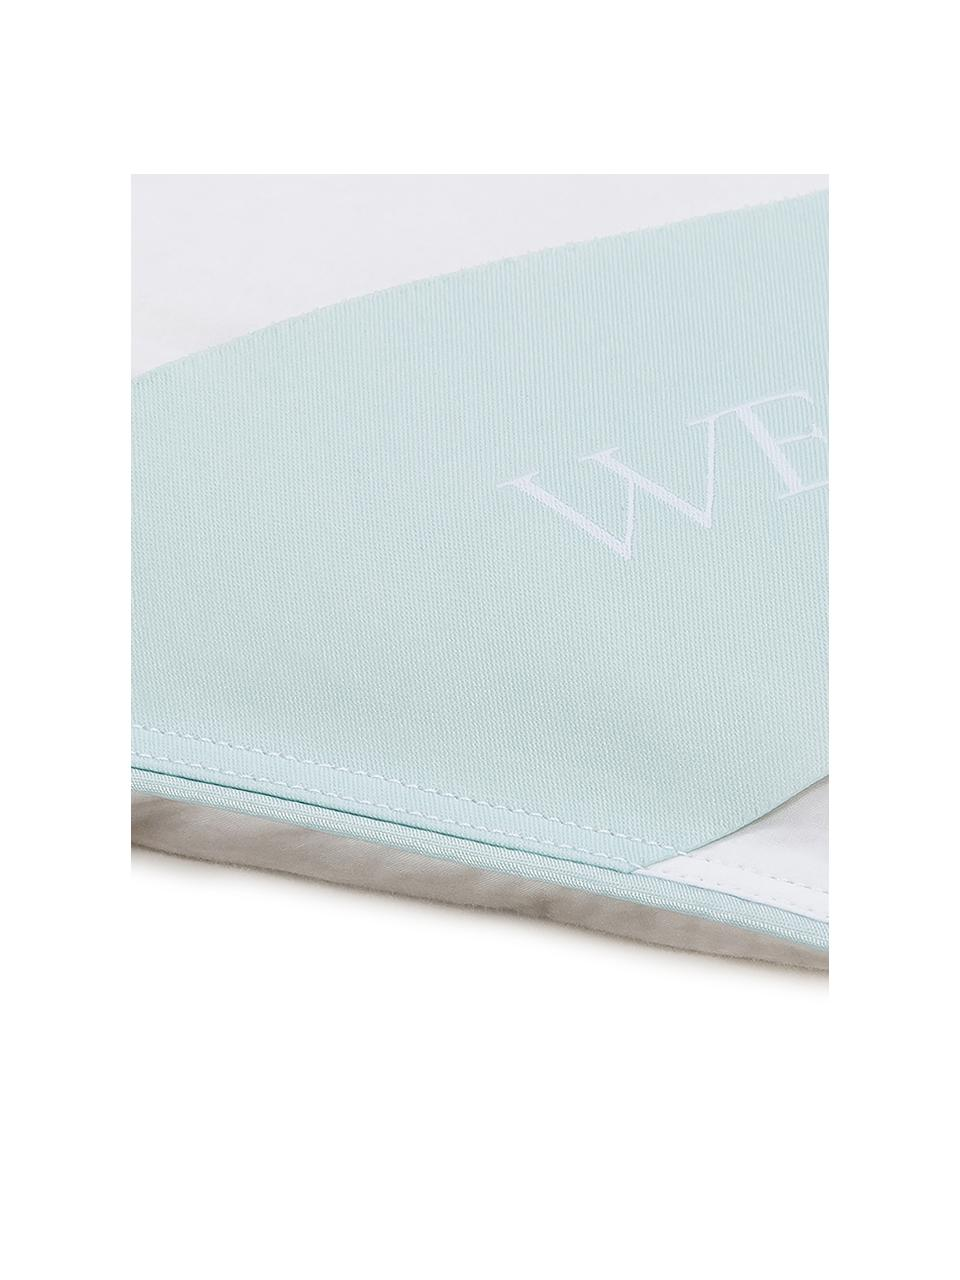 Edredón de plumón Komfort, ligero, Funda: 100%algodón, sarga de Ma, Blanco, Cama 150/160 cm (240 x L 220 cm)